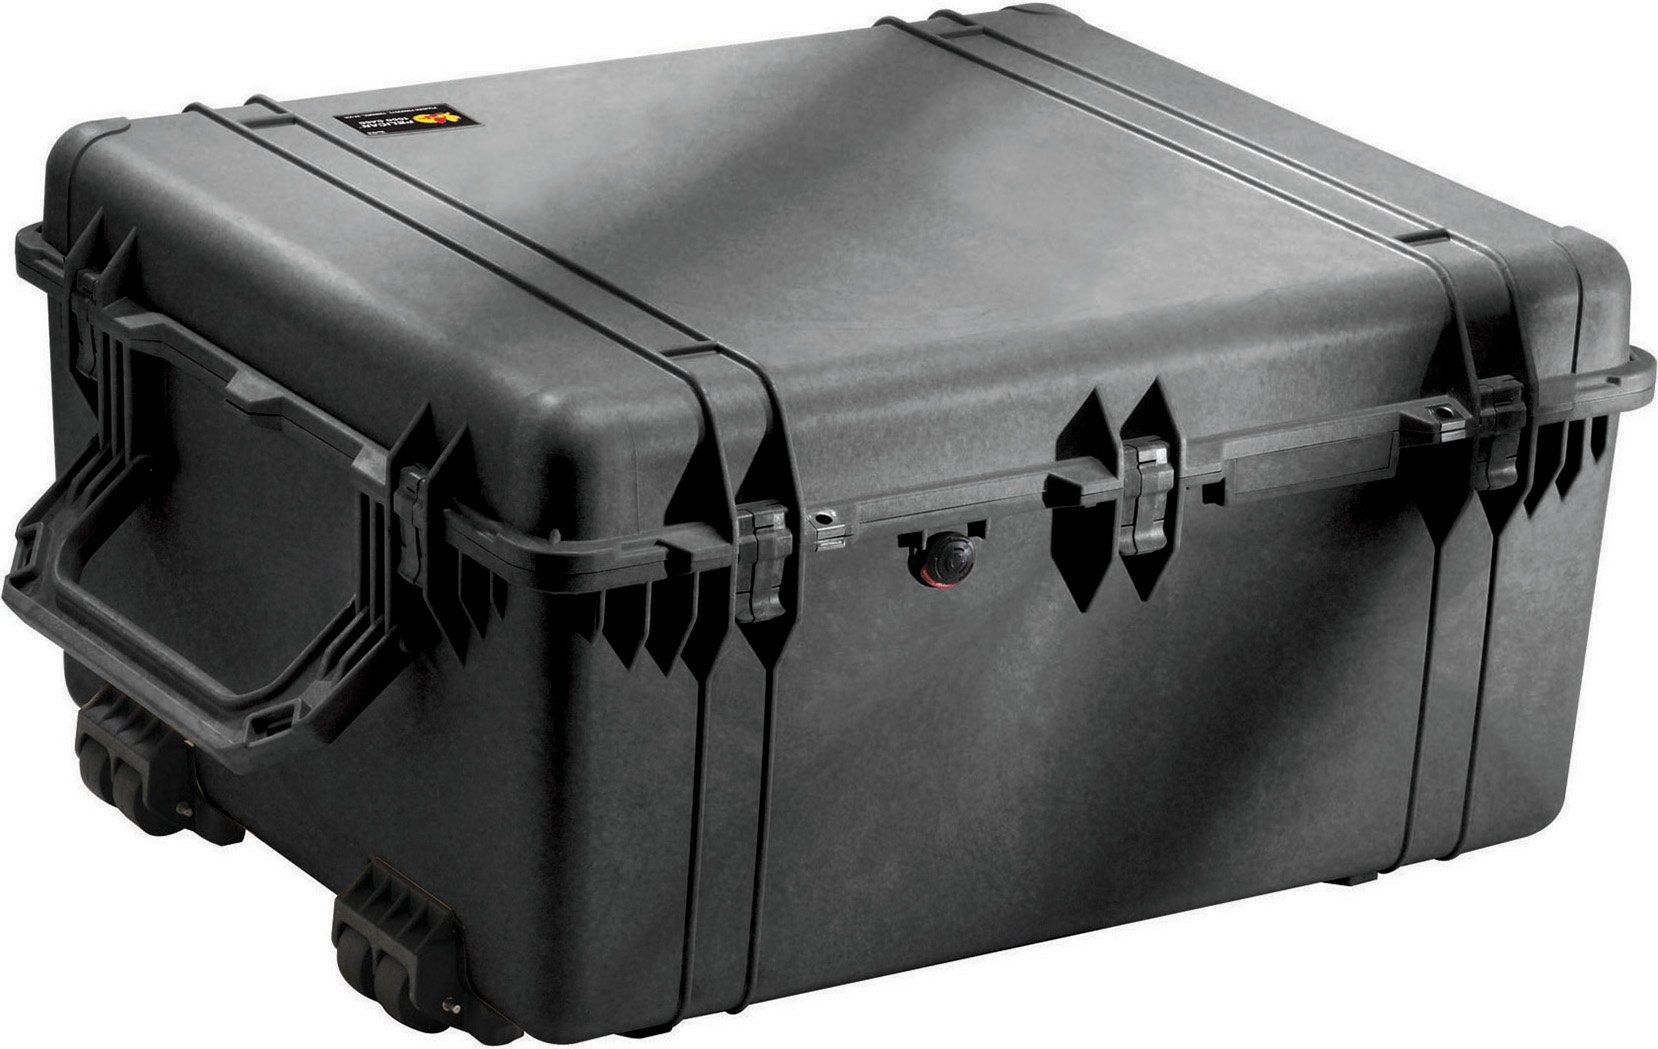 Pelican 1690 Case With Foam (Black)